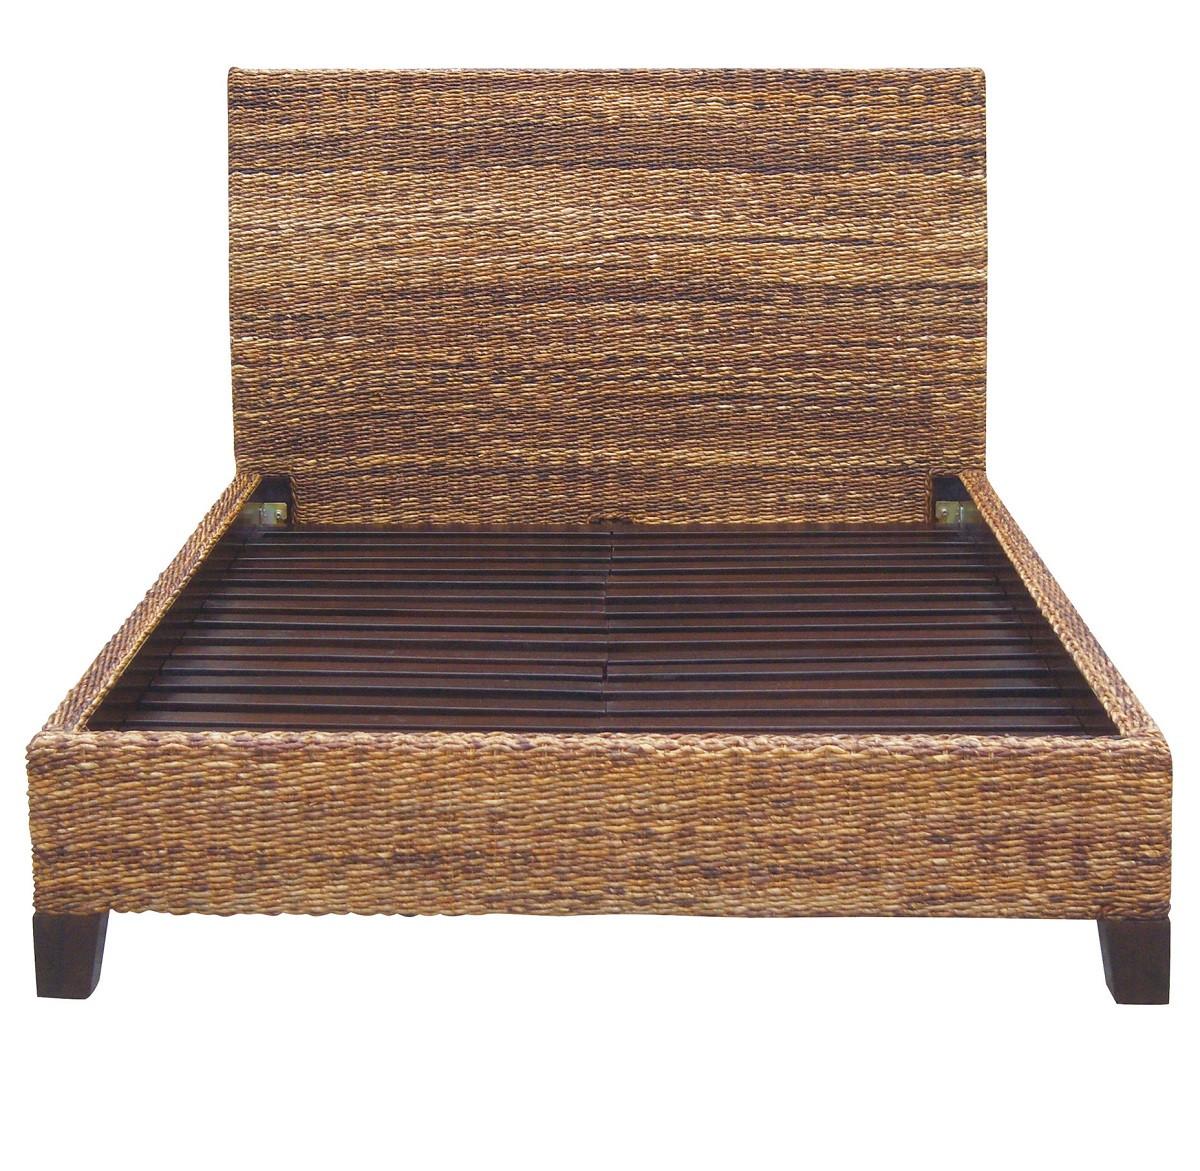 lanai banana leaf woven rattan queen platform bed frame - Queen Platform Bed Frames